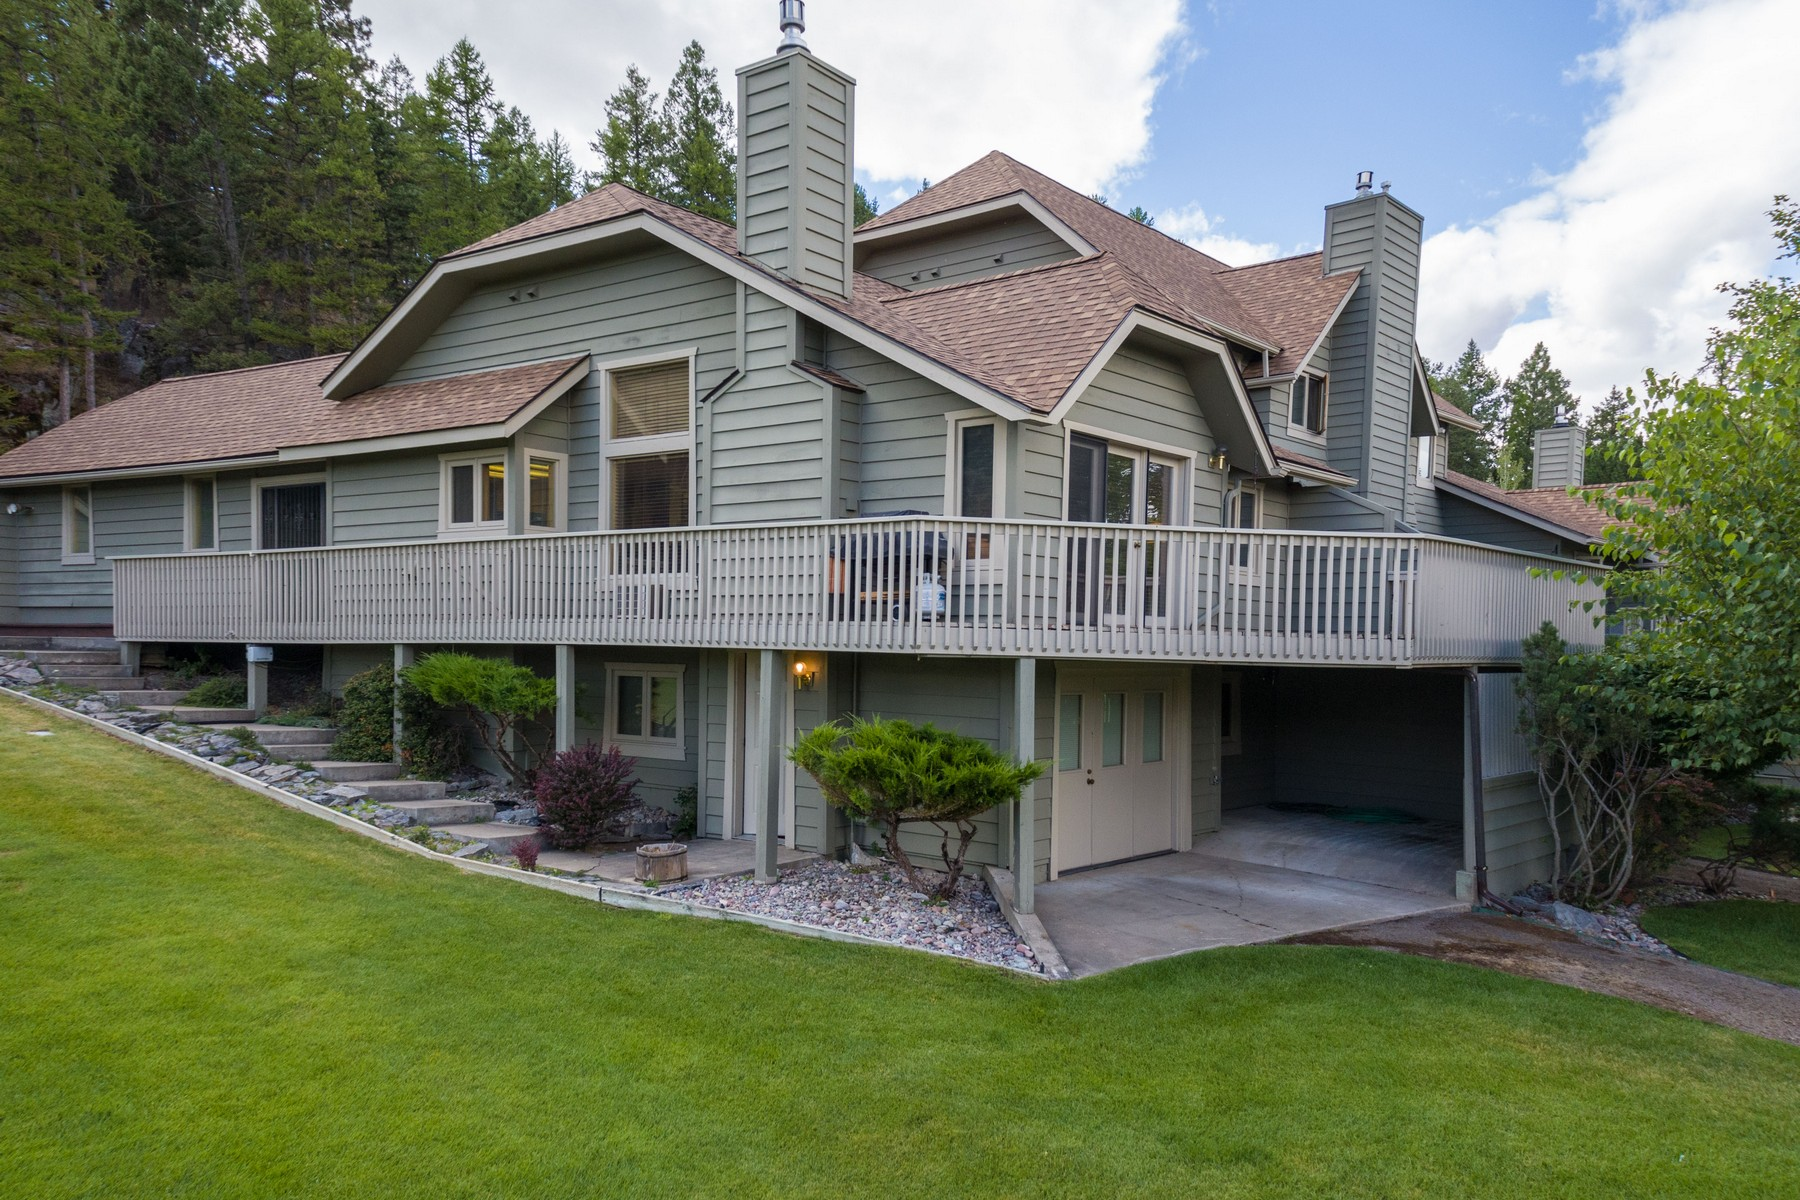 Villa per Vendita alle ore Eagle Bend Townhouse 23 Golf Terrace Bigfork, Montana, 59911 Stati Uniti